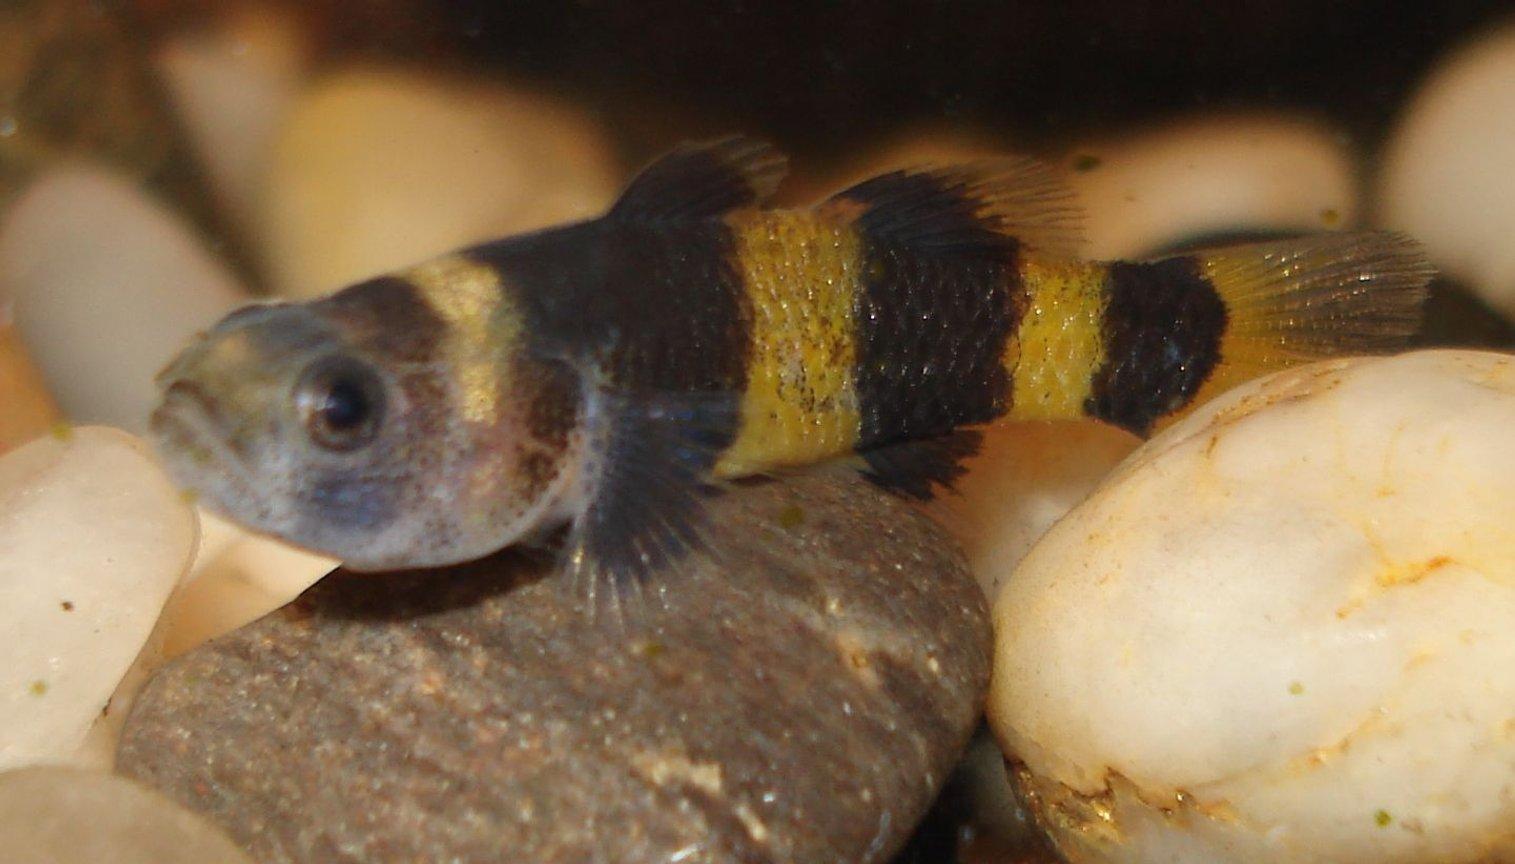 Bumblebee fish (Brachygobius jangojonas)